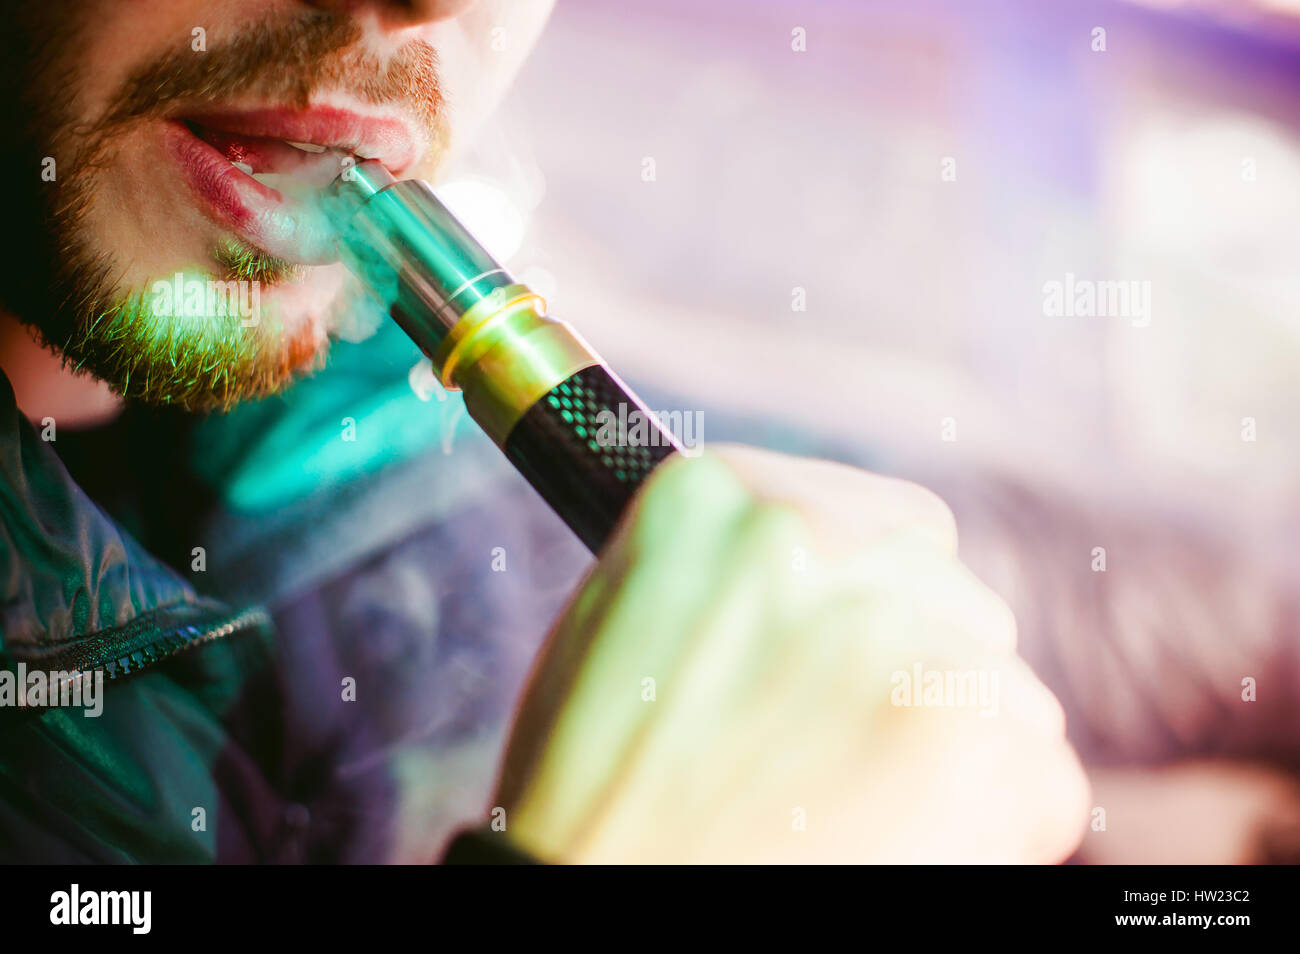 young vaper man with beard vaping mechanical mod. Guy smokes an electronic cigarette by blowing a smoke vapor. Bringing - Stock Image